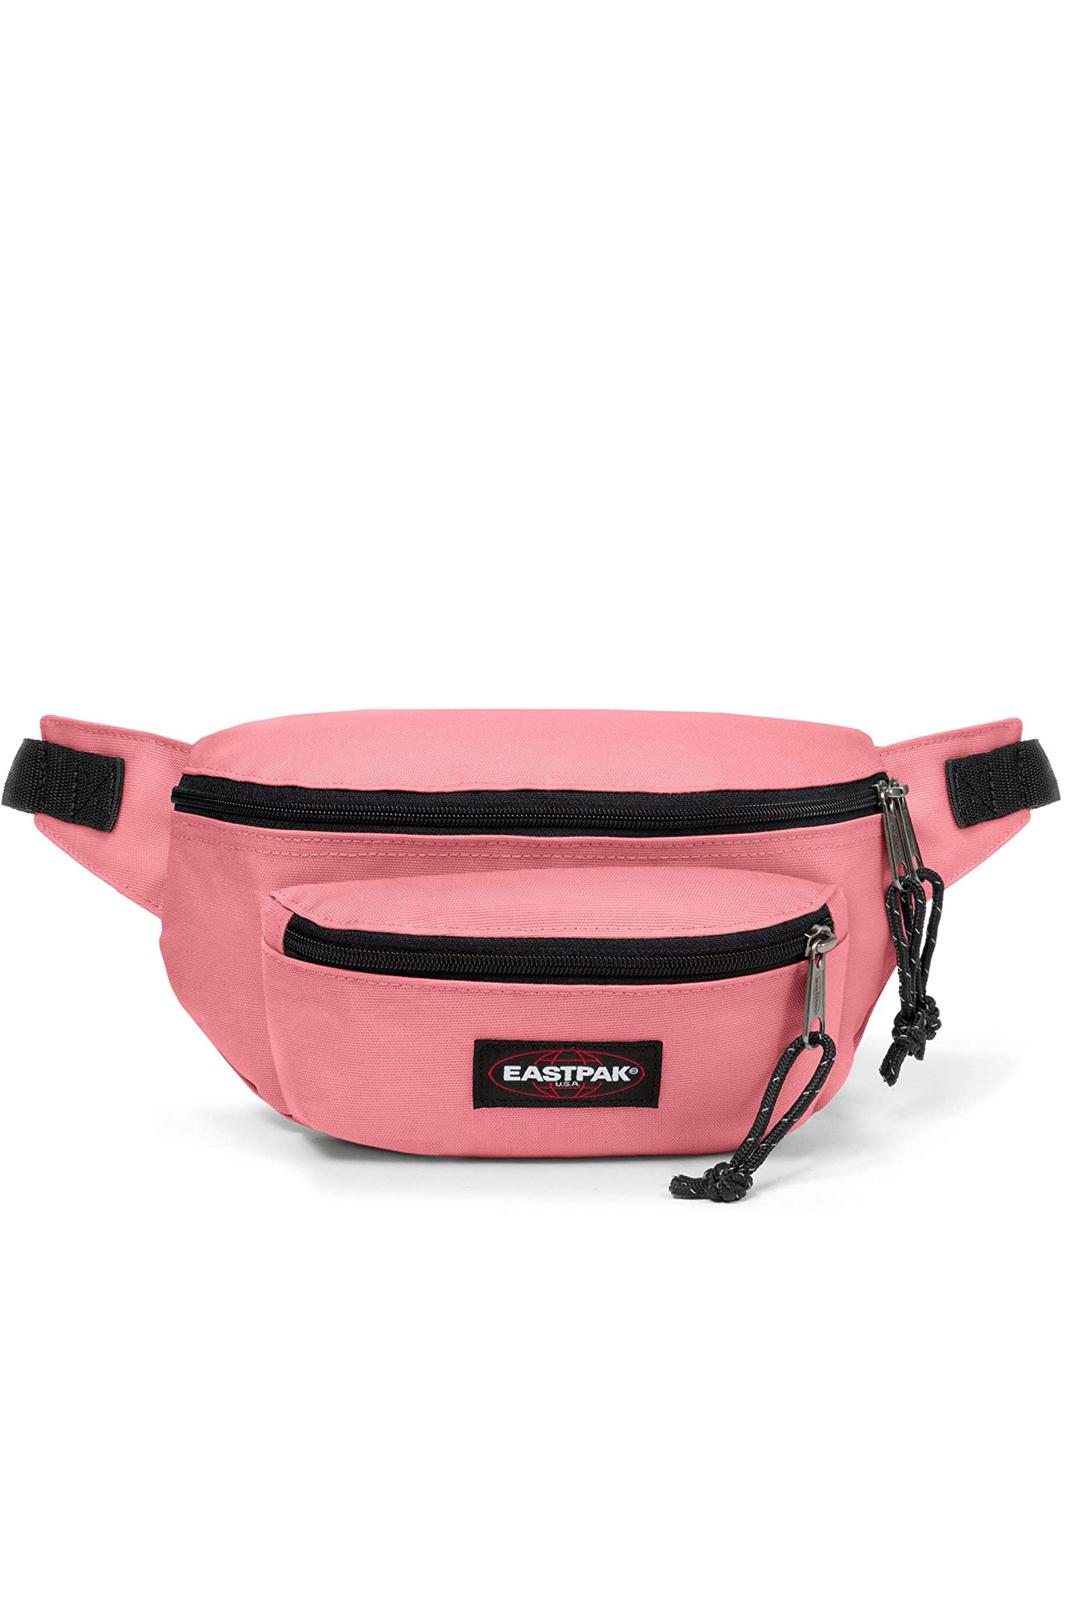 Sac porté épaule  Eastpak EK07390Z Seashell Pink